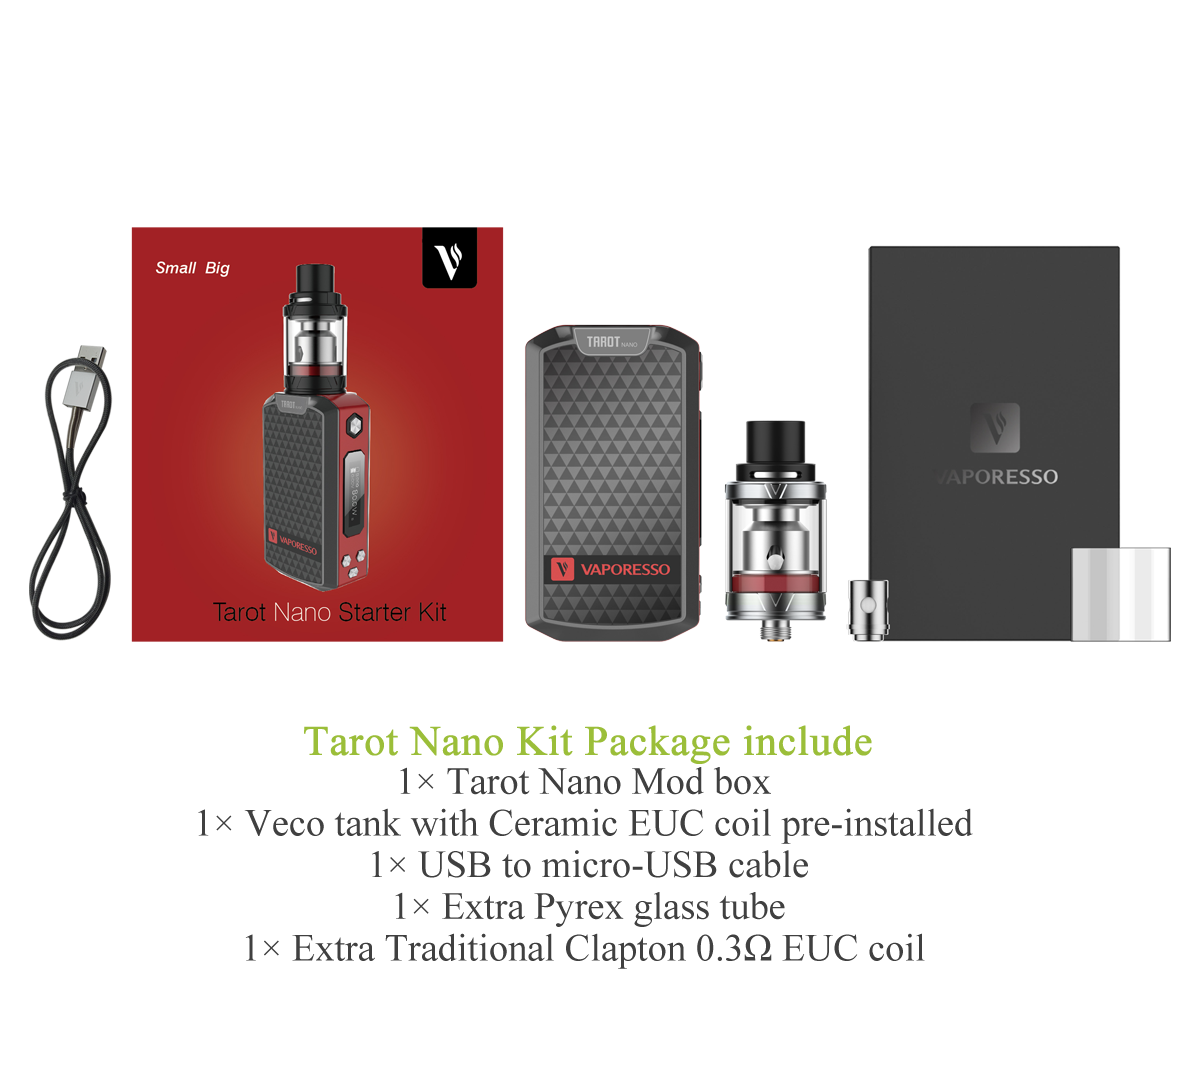 tarot-nano-kit-package-3